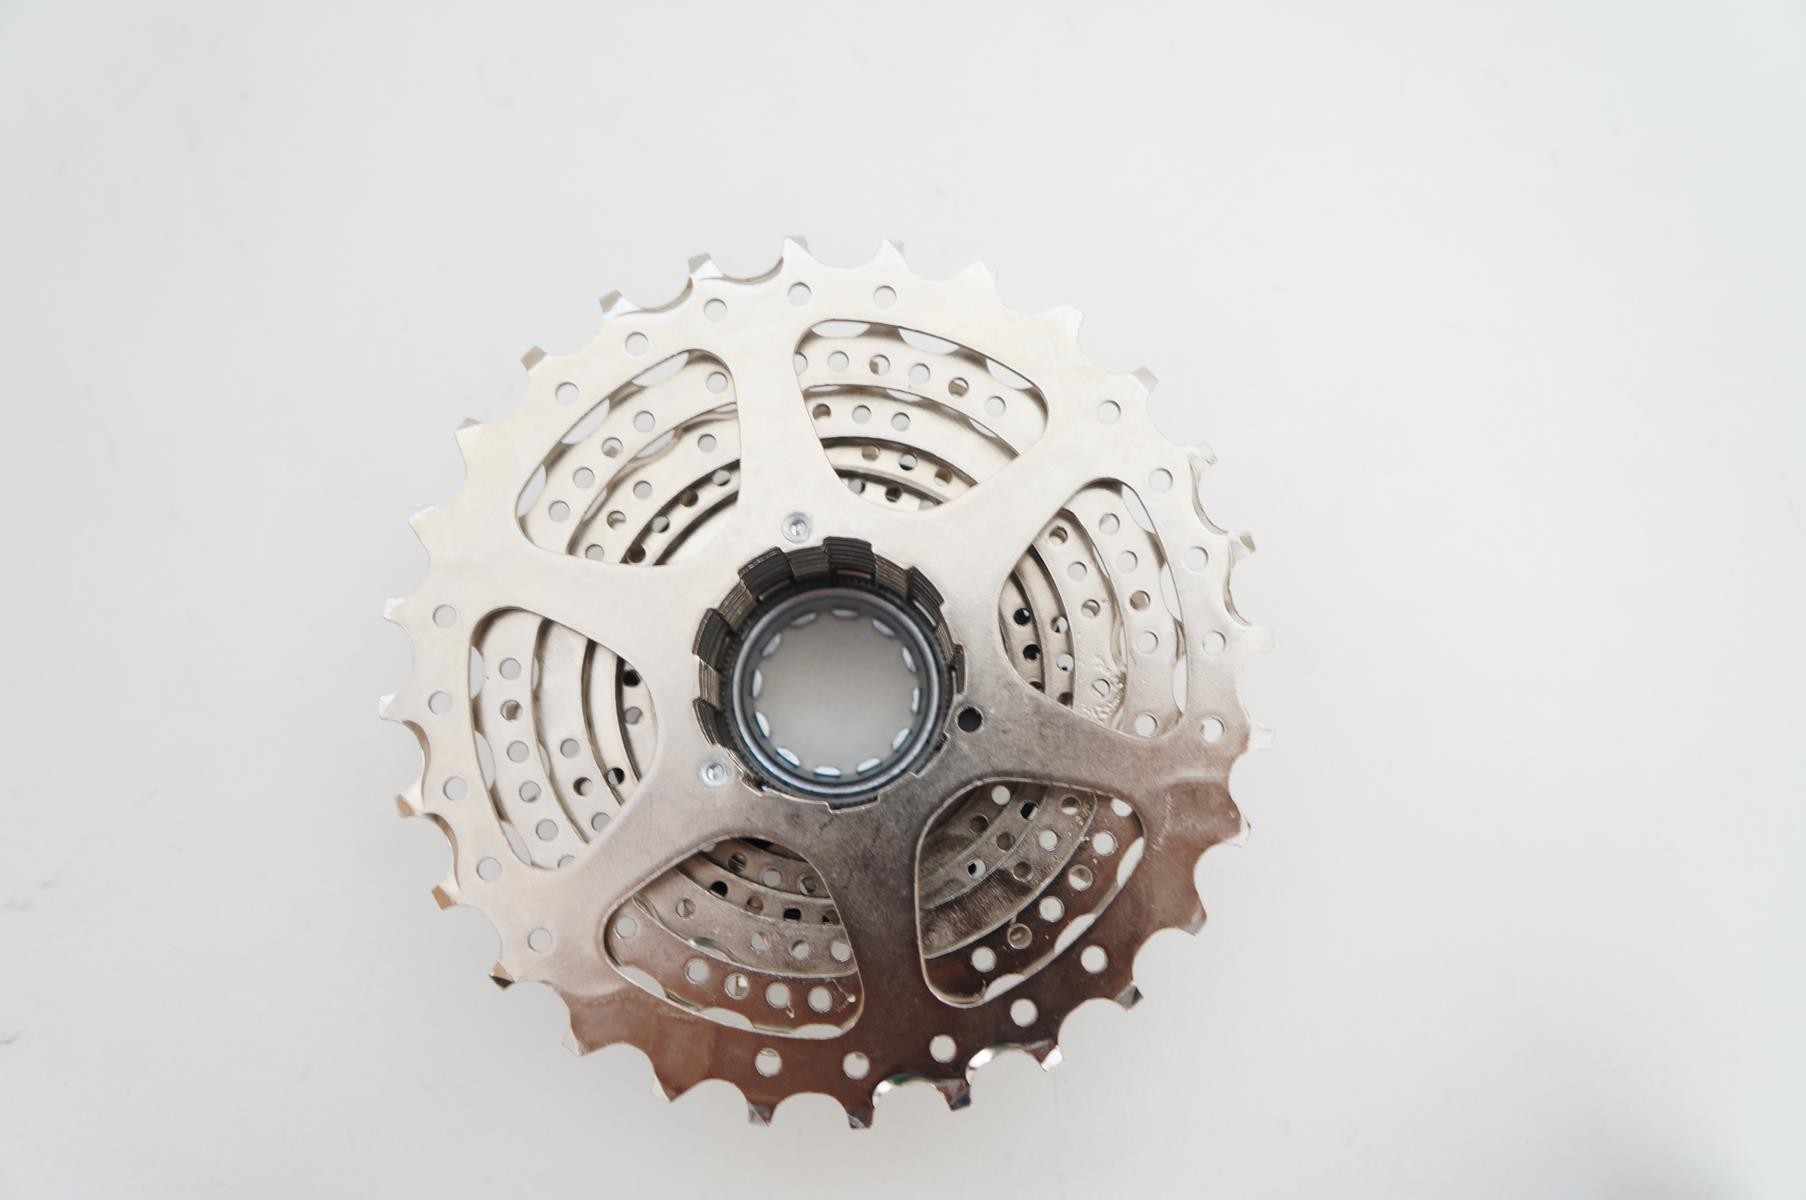 Cassete Bicicleta Speed Shimano Tiagra HG50 11-28 8 Velocidades Road